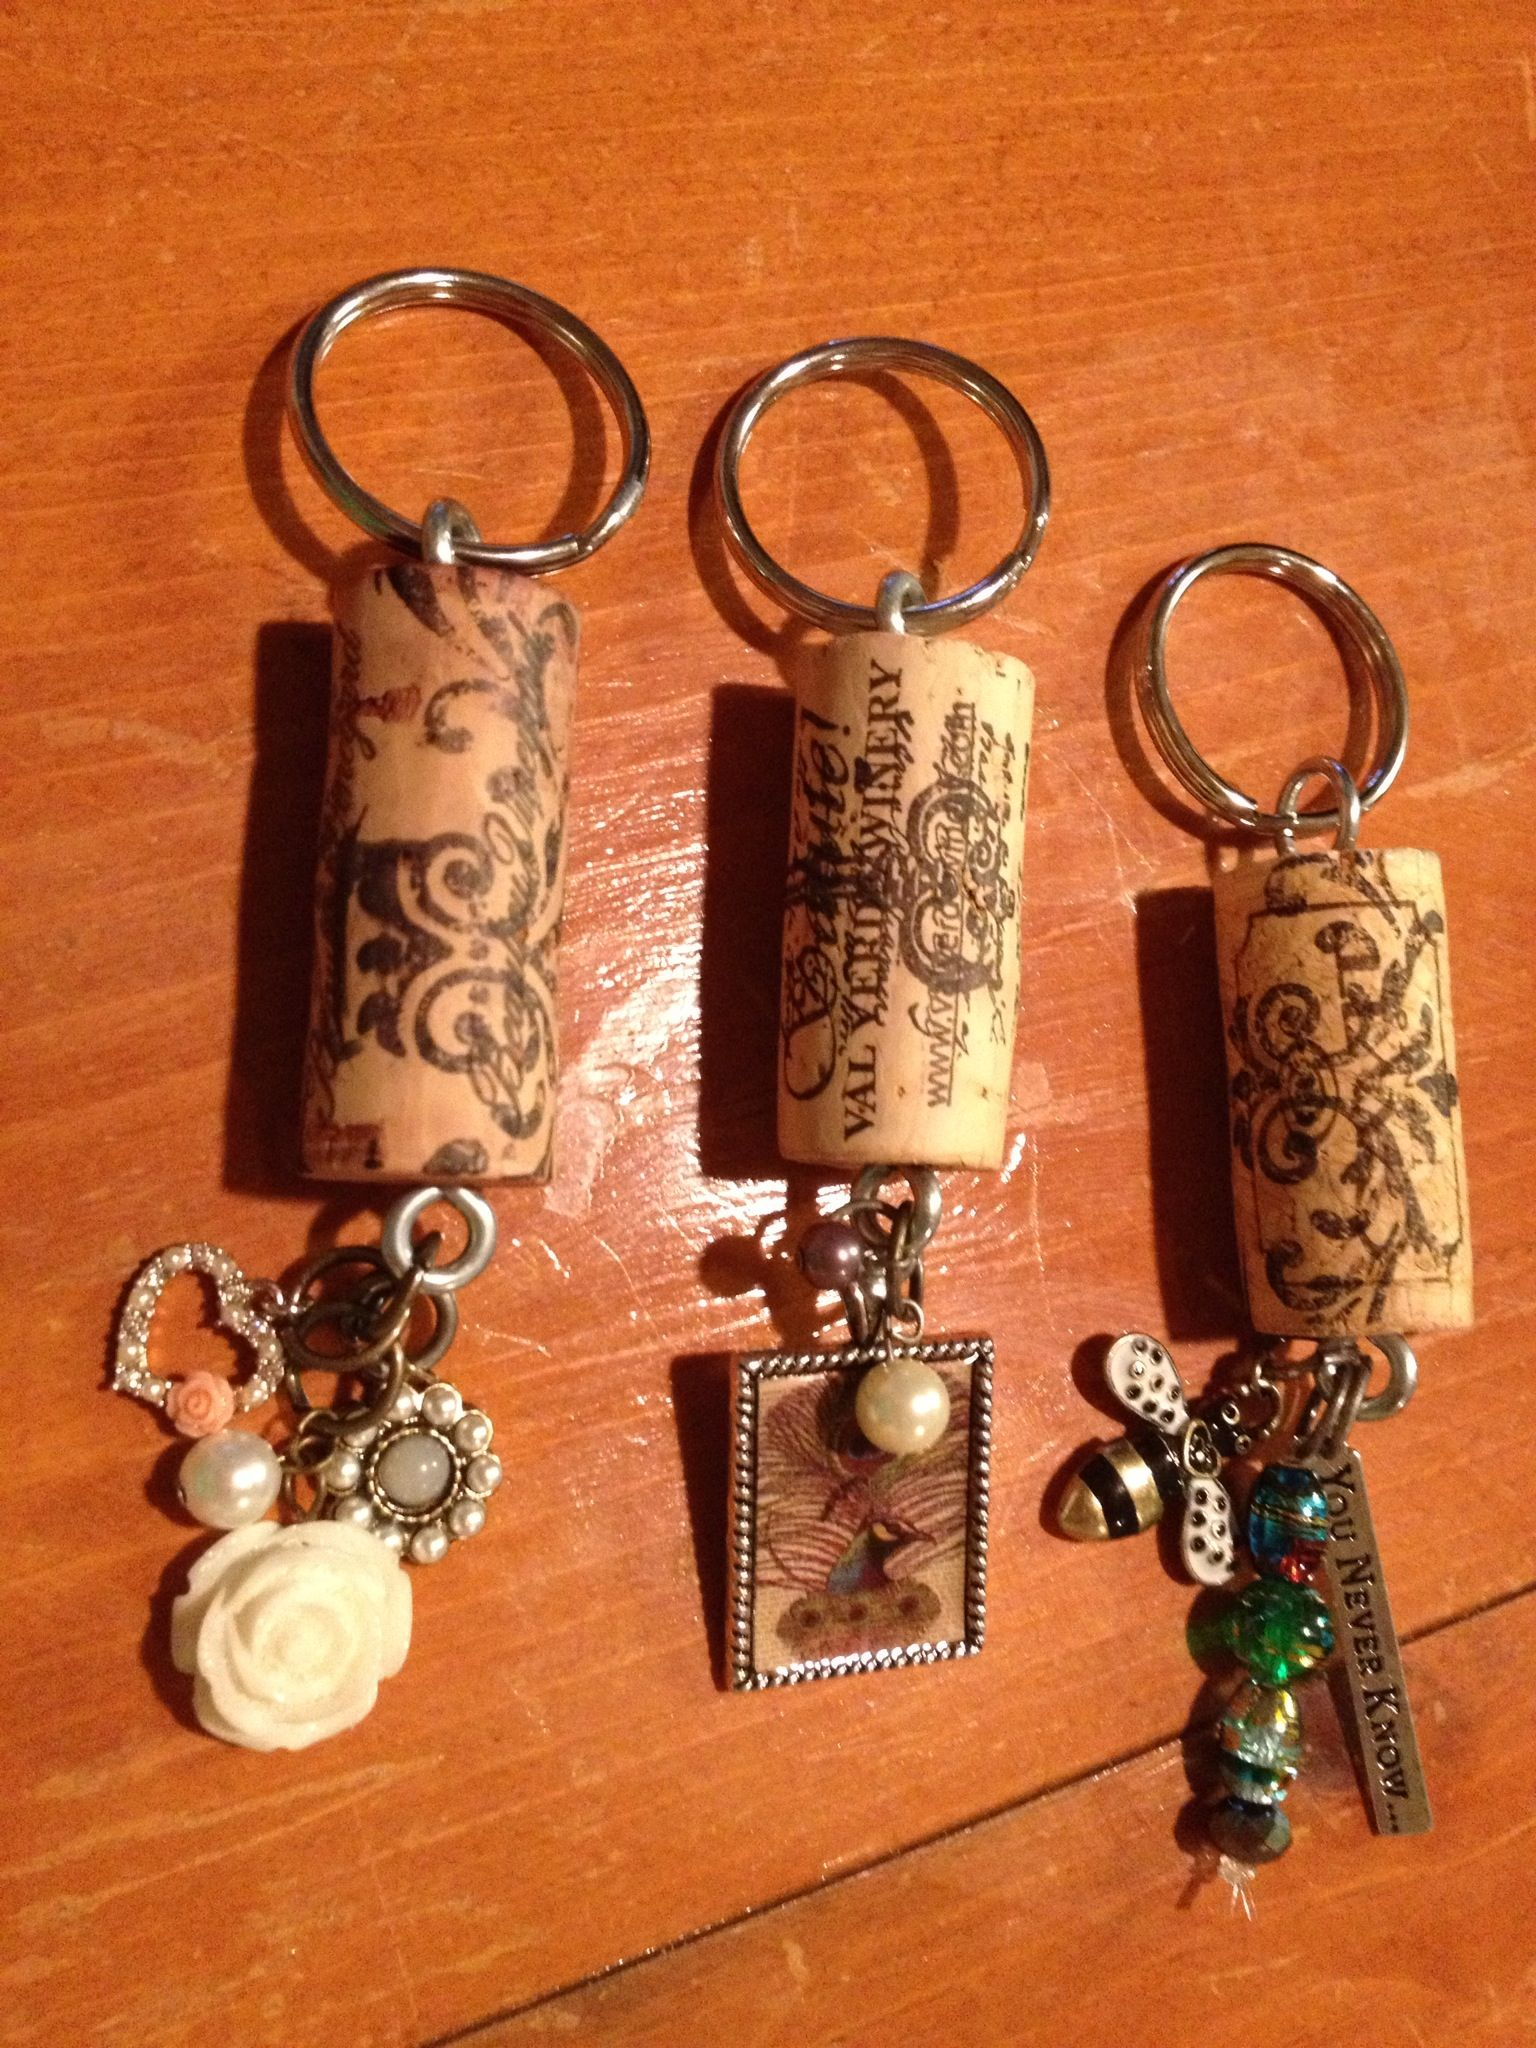 Wine bottle corks crafts - Paracord Keychain Cancer Awareness Royal Blue Pink Green And More Gift For Him Keychain For Him Keychain For Dad Cancer Survivor